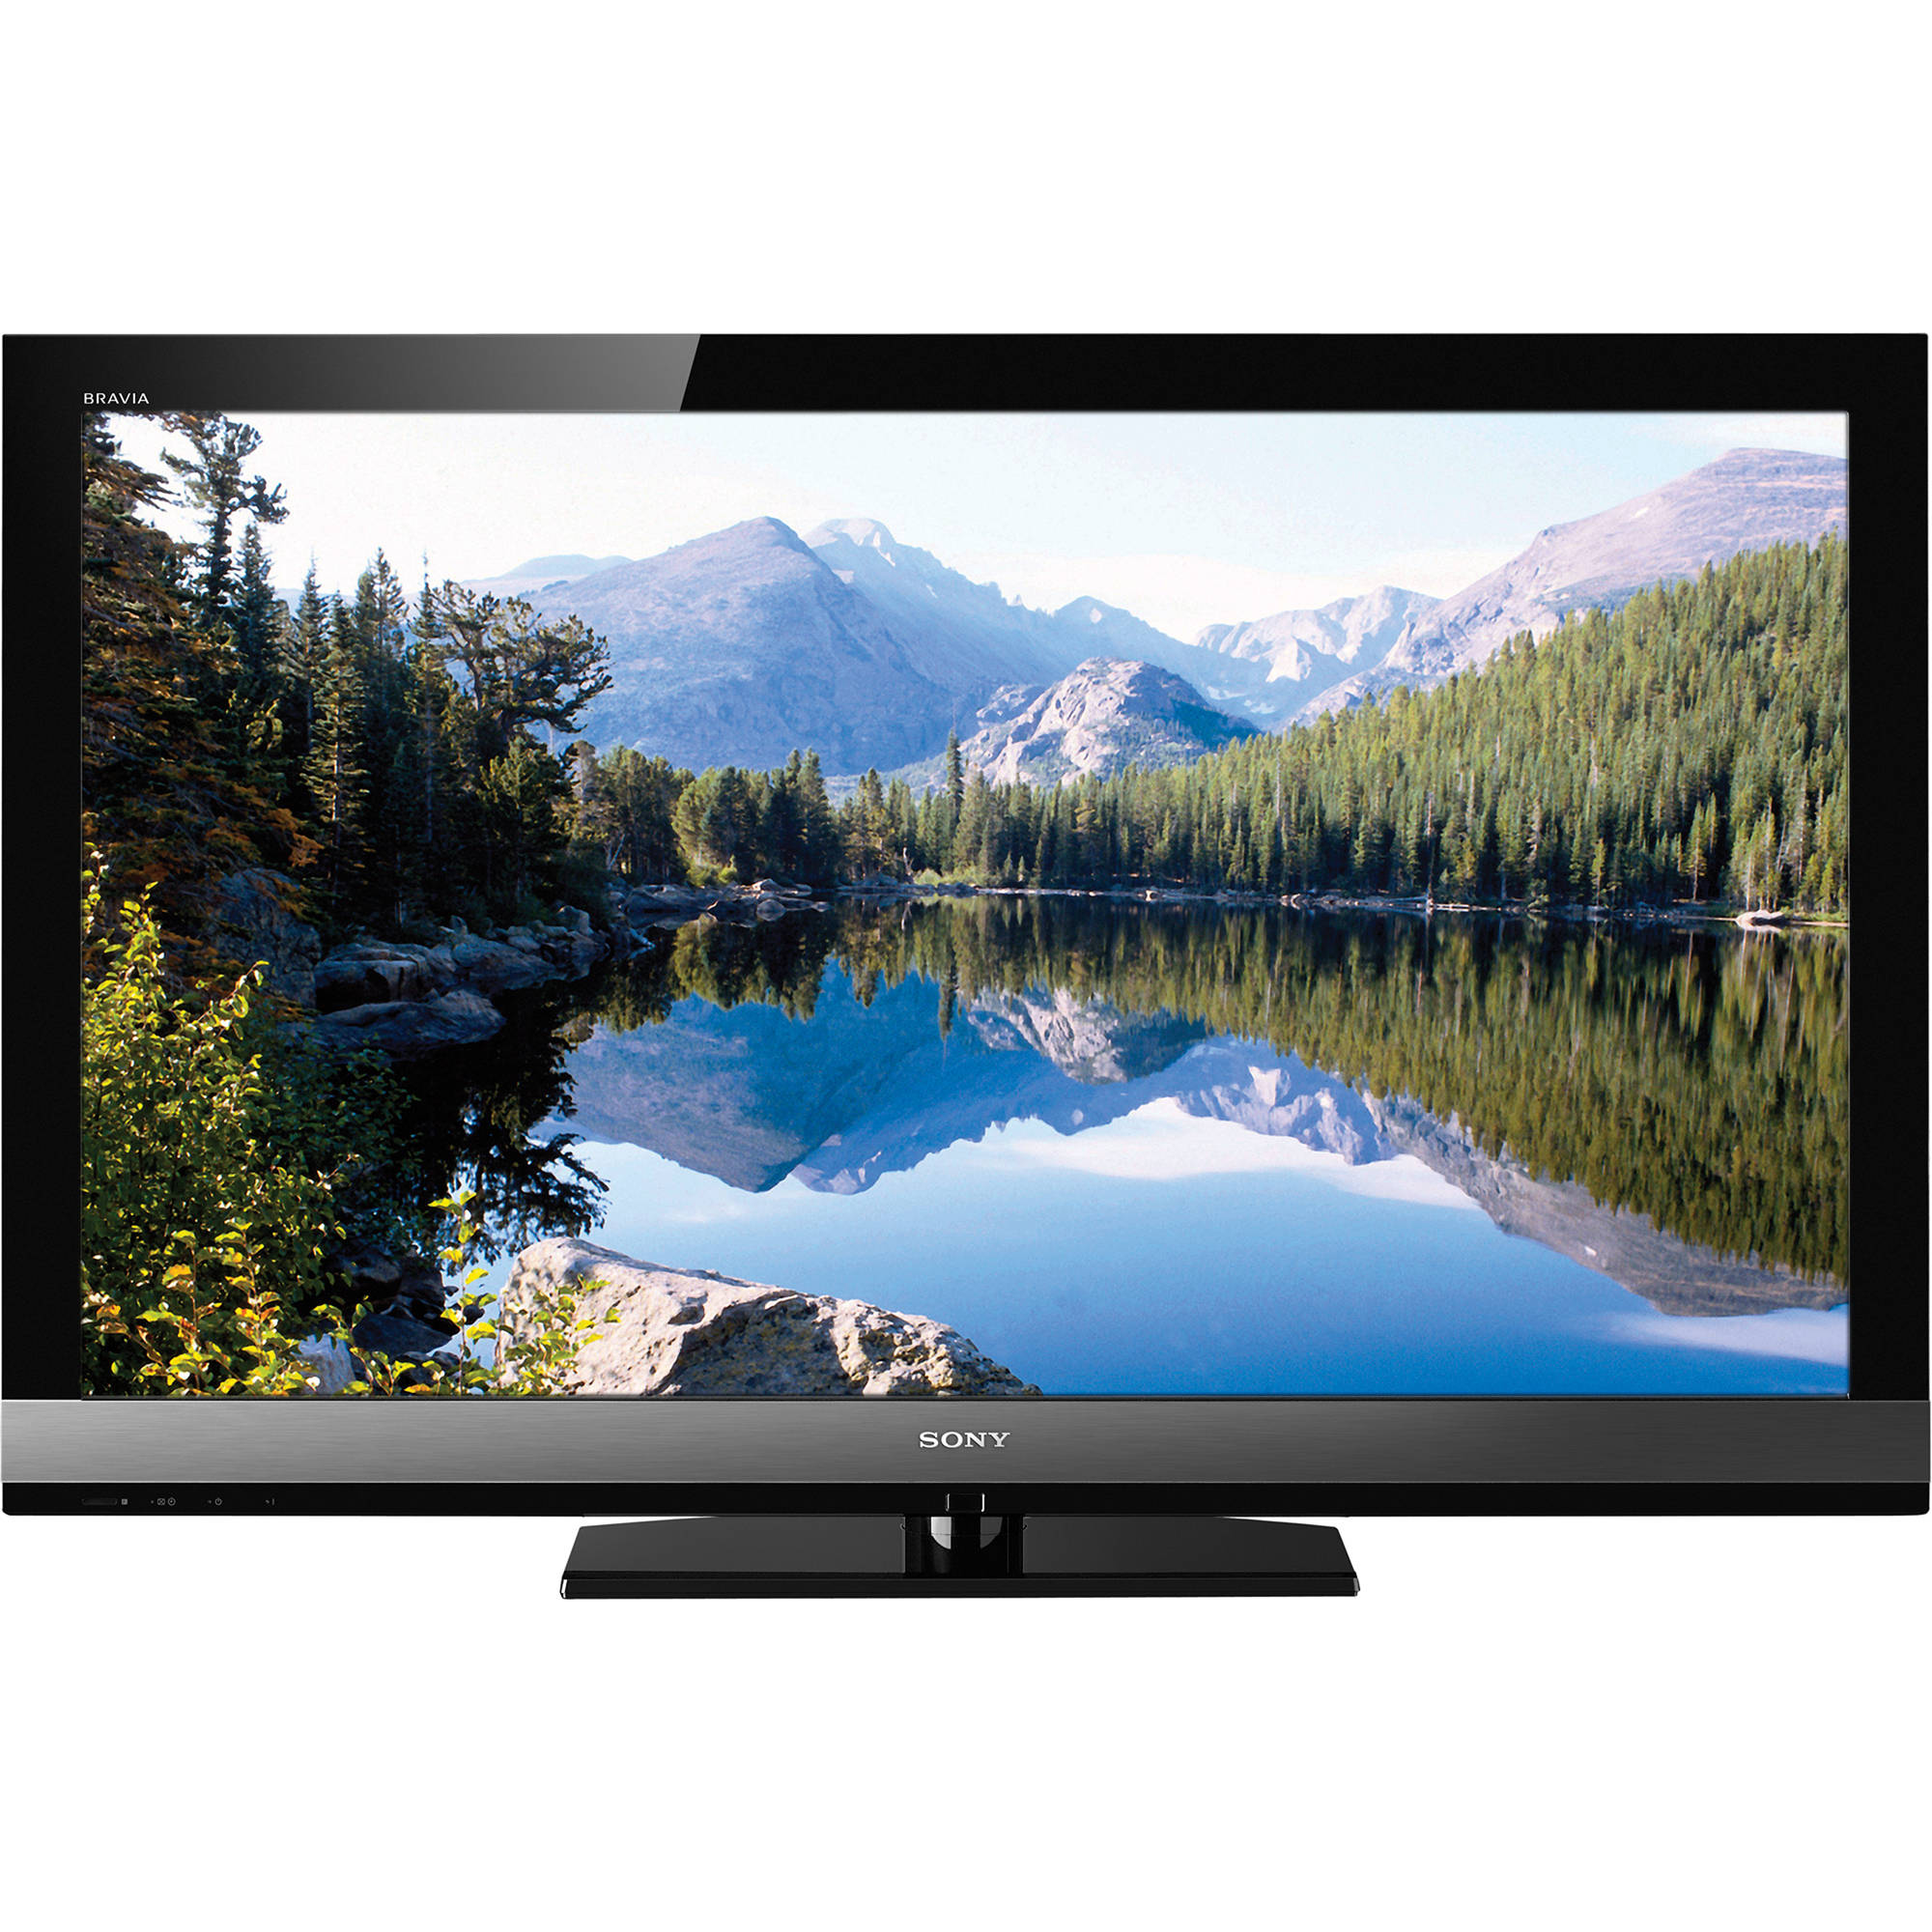 Sony KDL-32CX521 BRAVIA HDTV Drivers Windows